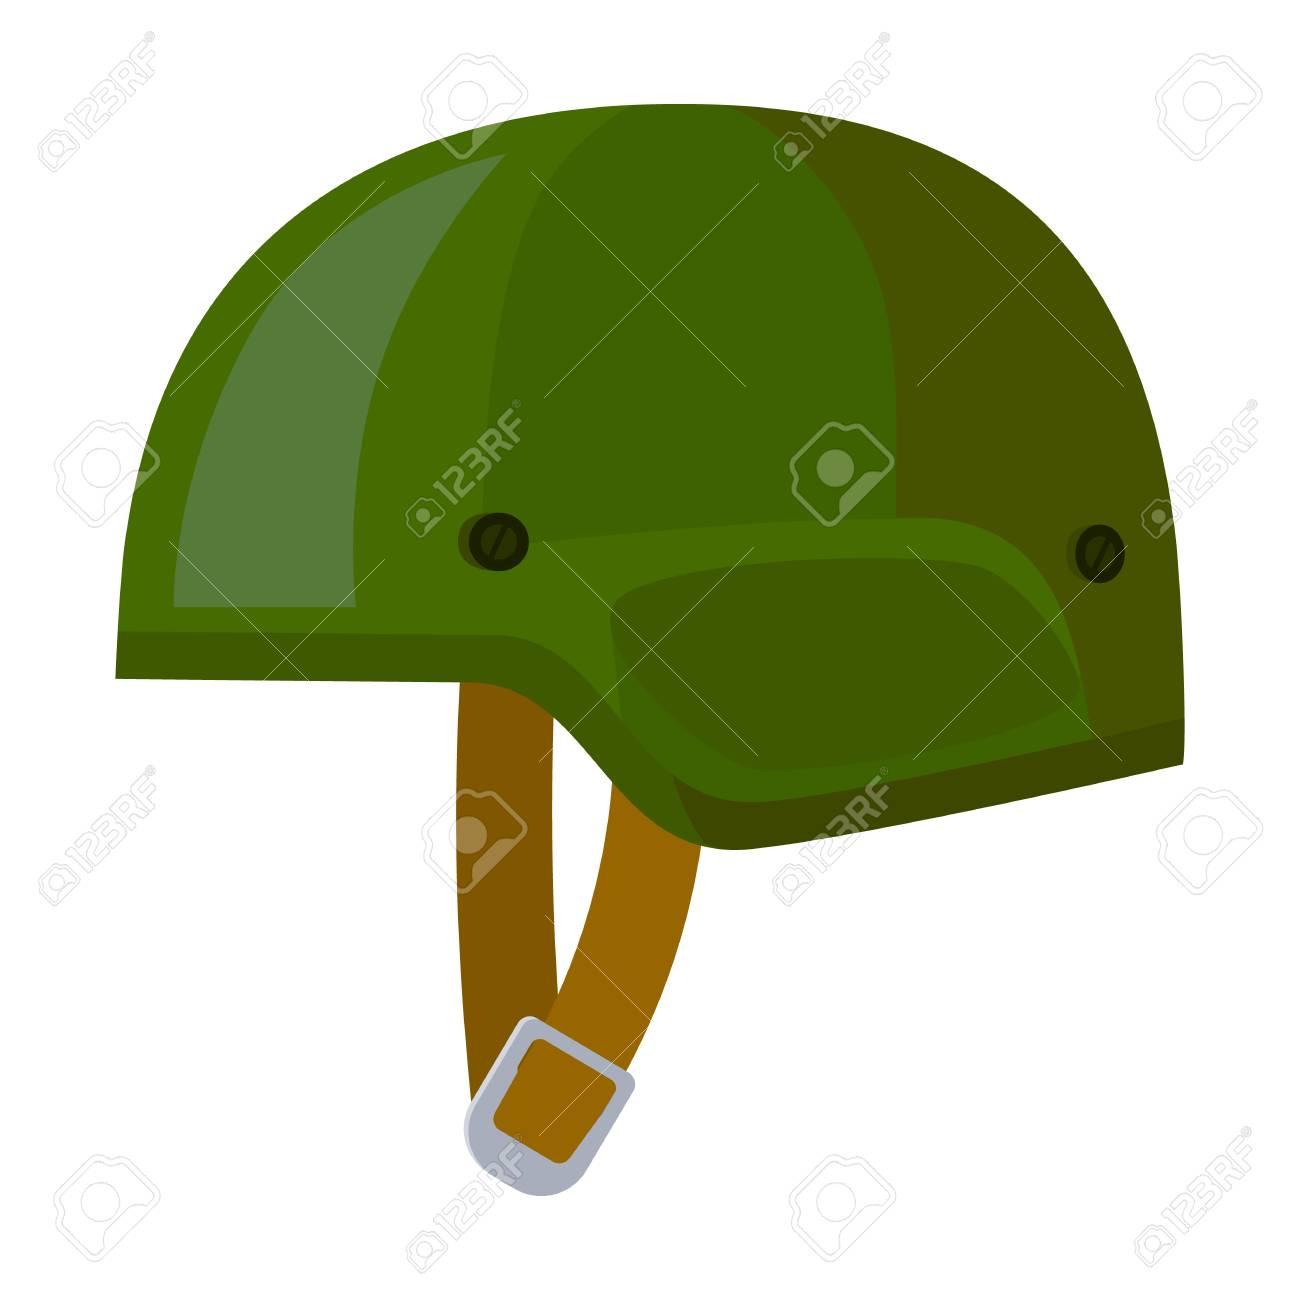 army helmet icon in cartoon style isolated on white background rh 123rf com Cartoon Army Person Cartoon Heart